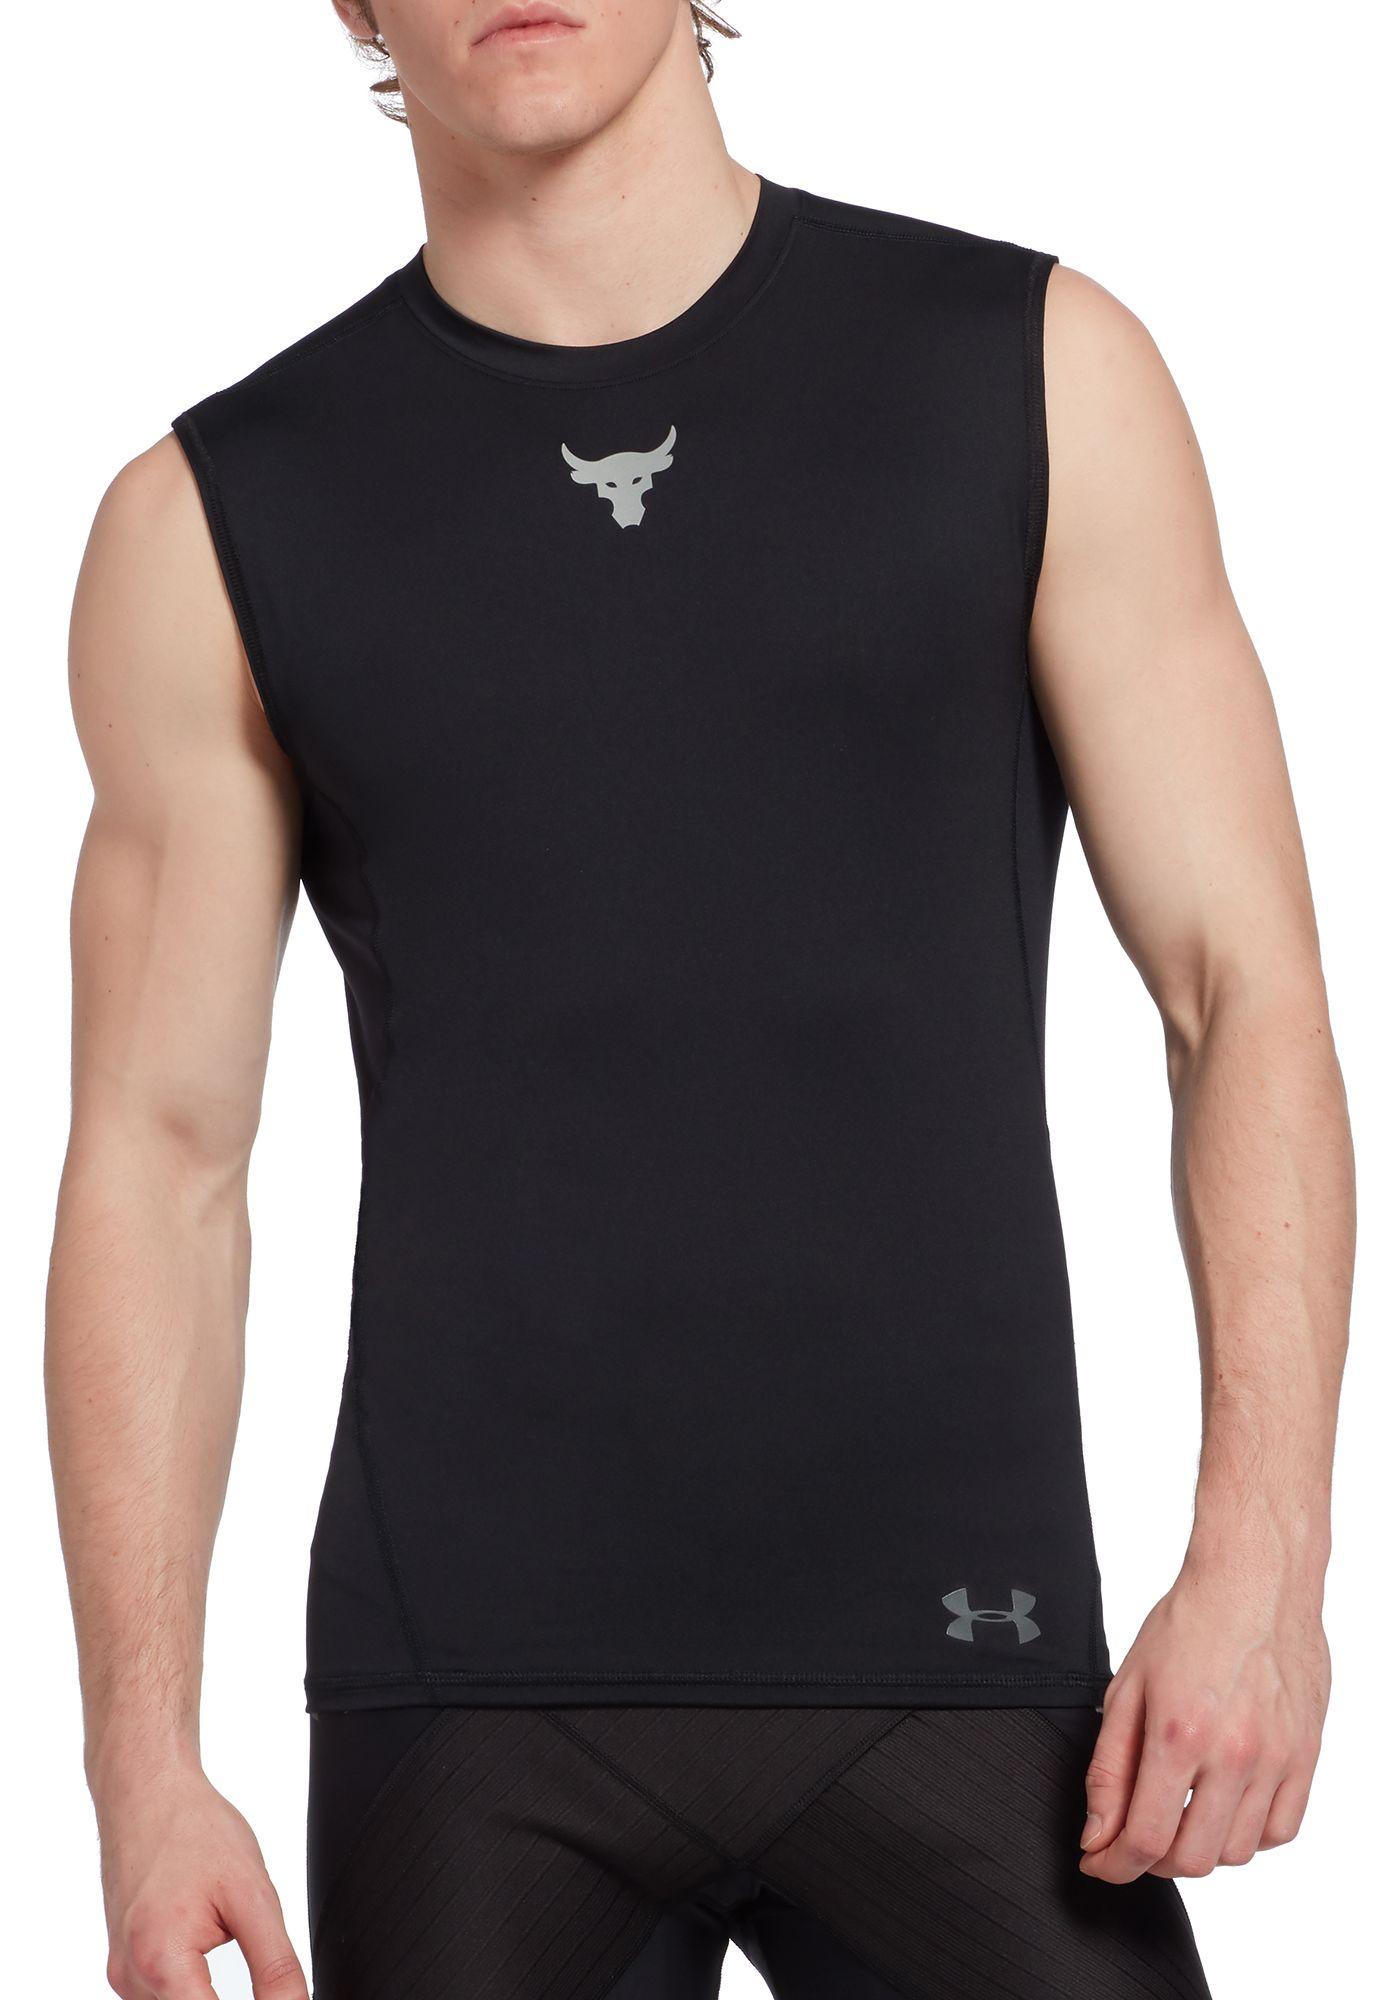 Under Armour Men's Project Rock HeatGear Compression Sleeveless Shirt